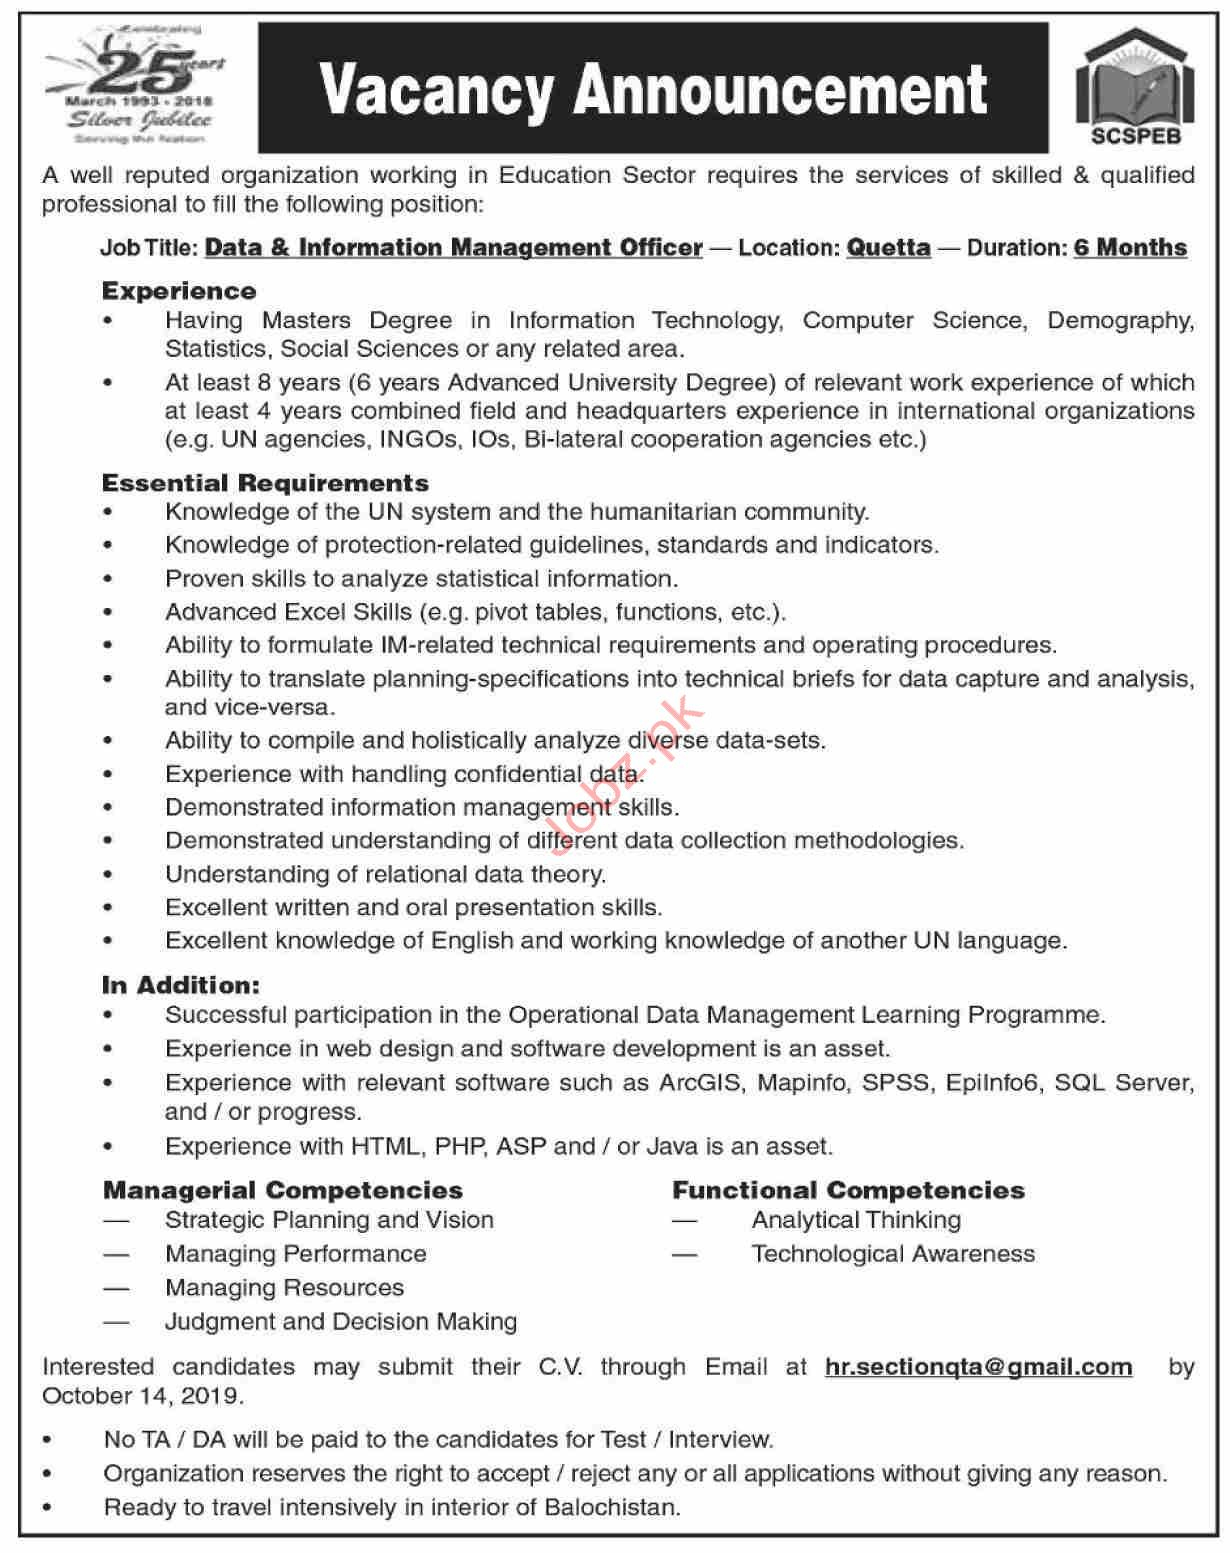 Information Management Officer Jobs in Quetta